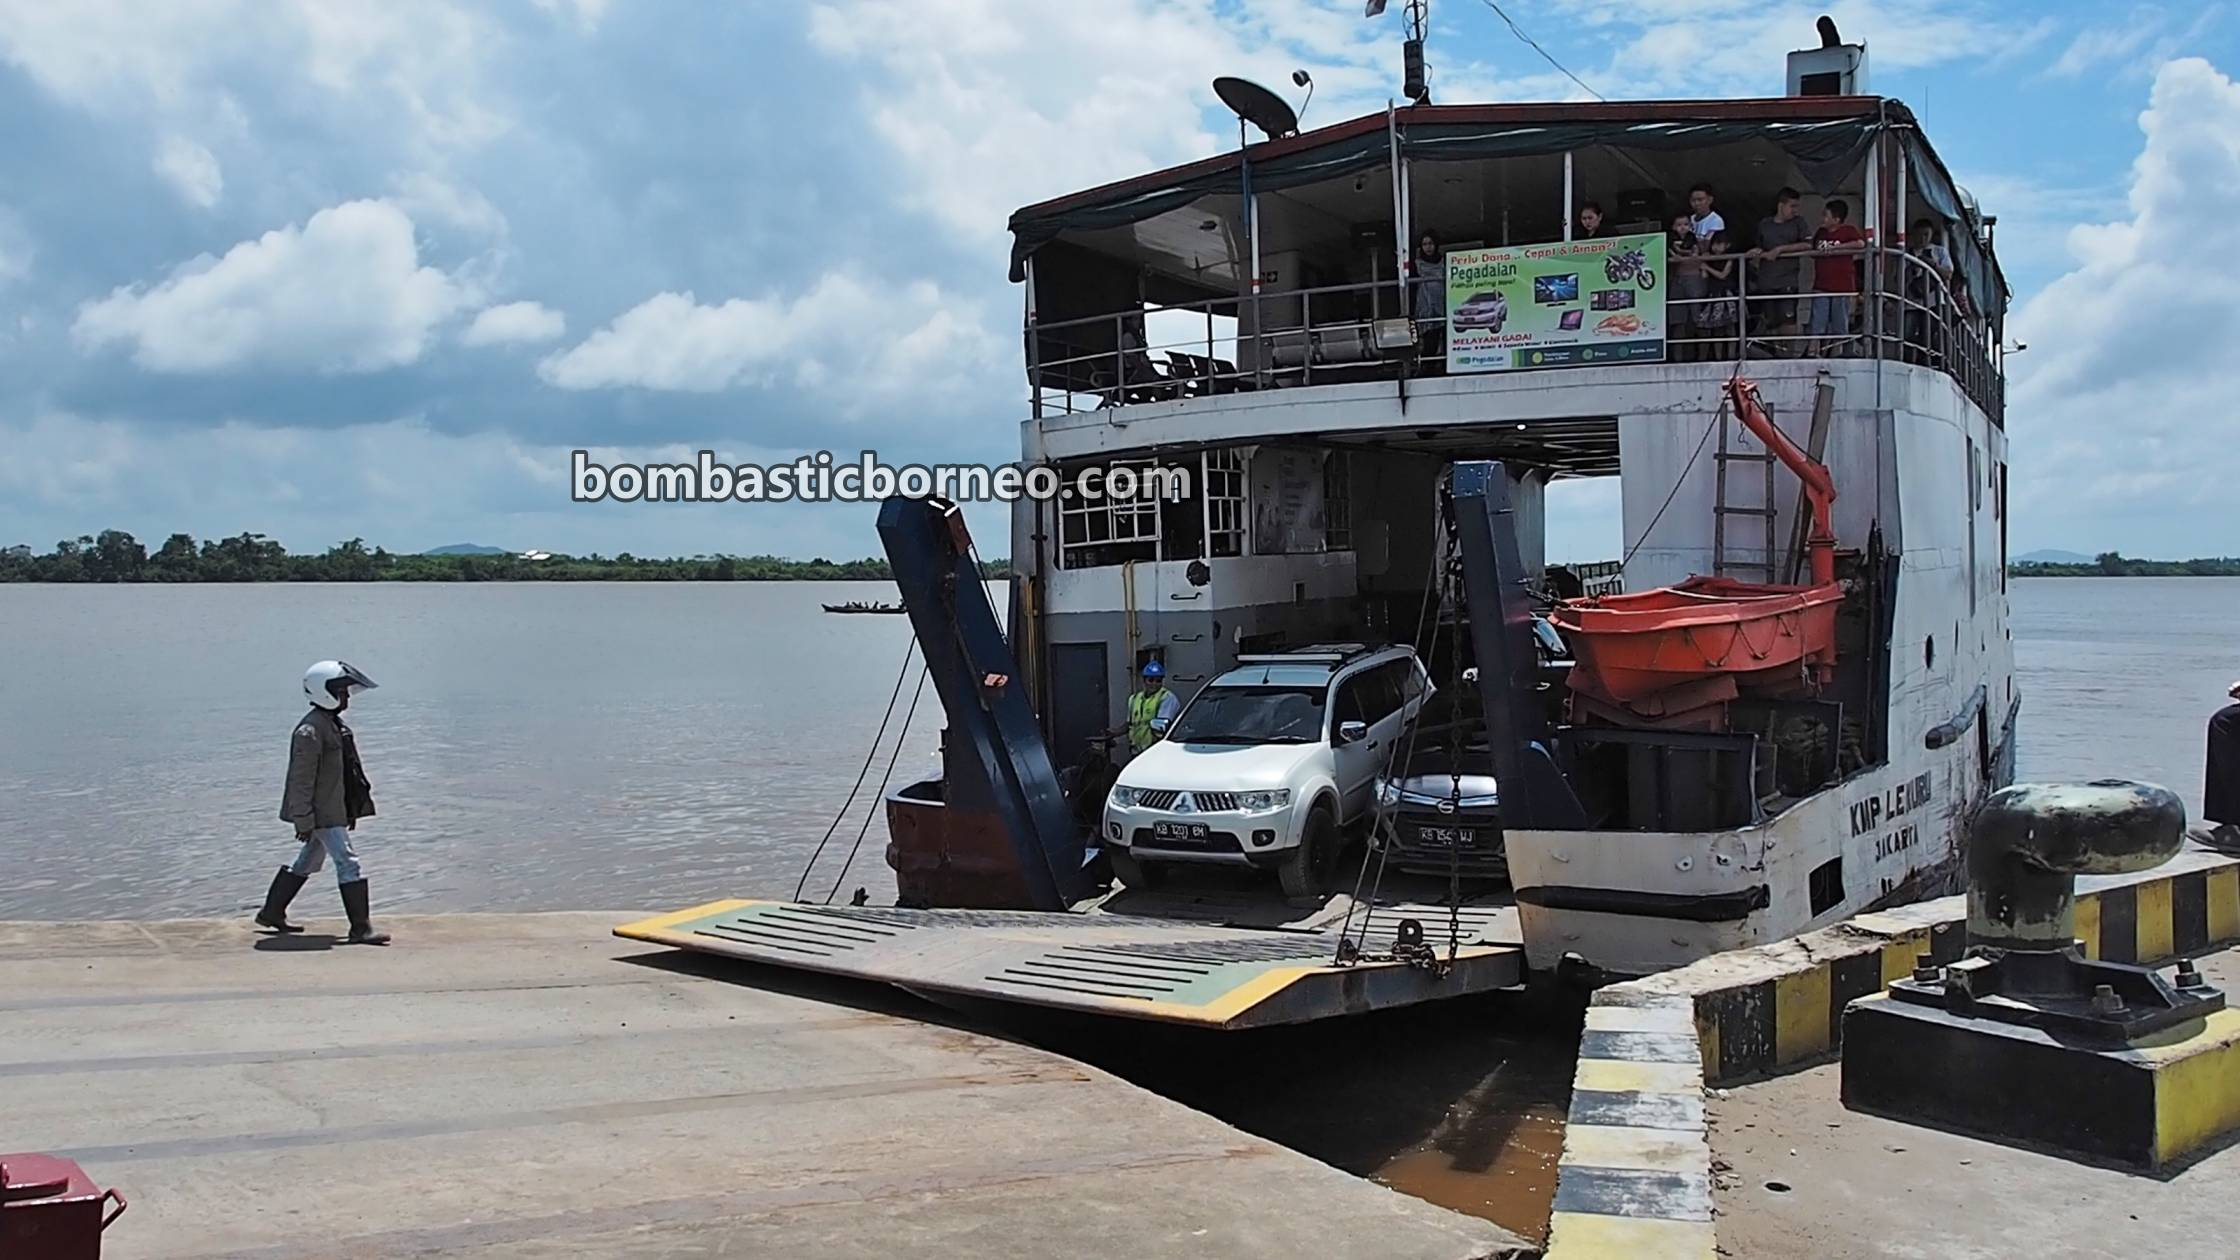 adventure, traditional, Tebas Kuala Ferry port, Malay fishing village, Kampung Melayu, Indonesia, Kalimantan Barat, Jawai Laut, Tourism, travel guide, Borneo, Cross Border, 跨境婆罗洲游踪, 印尼西加里曼丹, 三发马来渔村